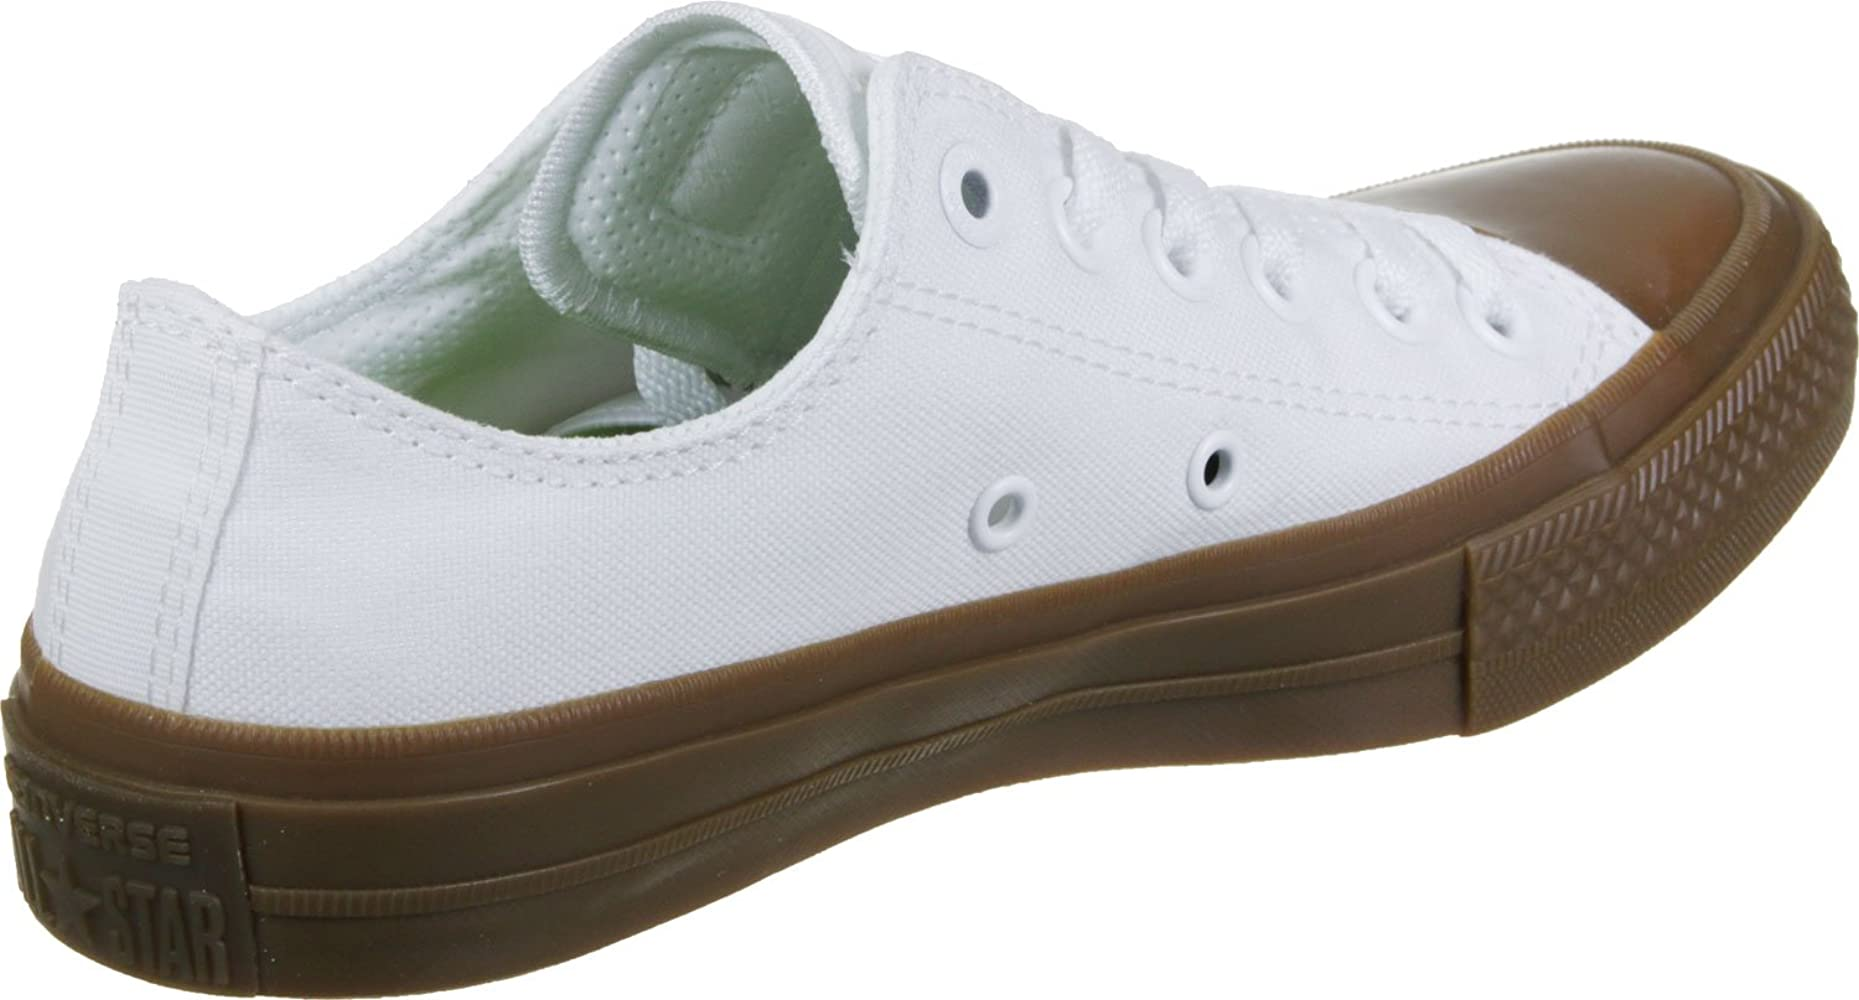 Converse Chuck Taylor All Star II Gum OX Sneaker 7 US 40